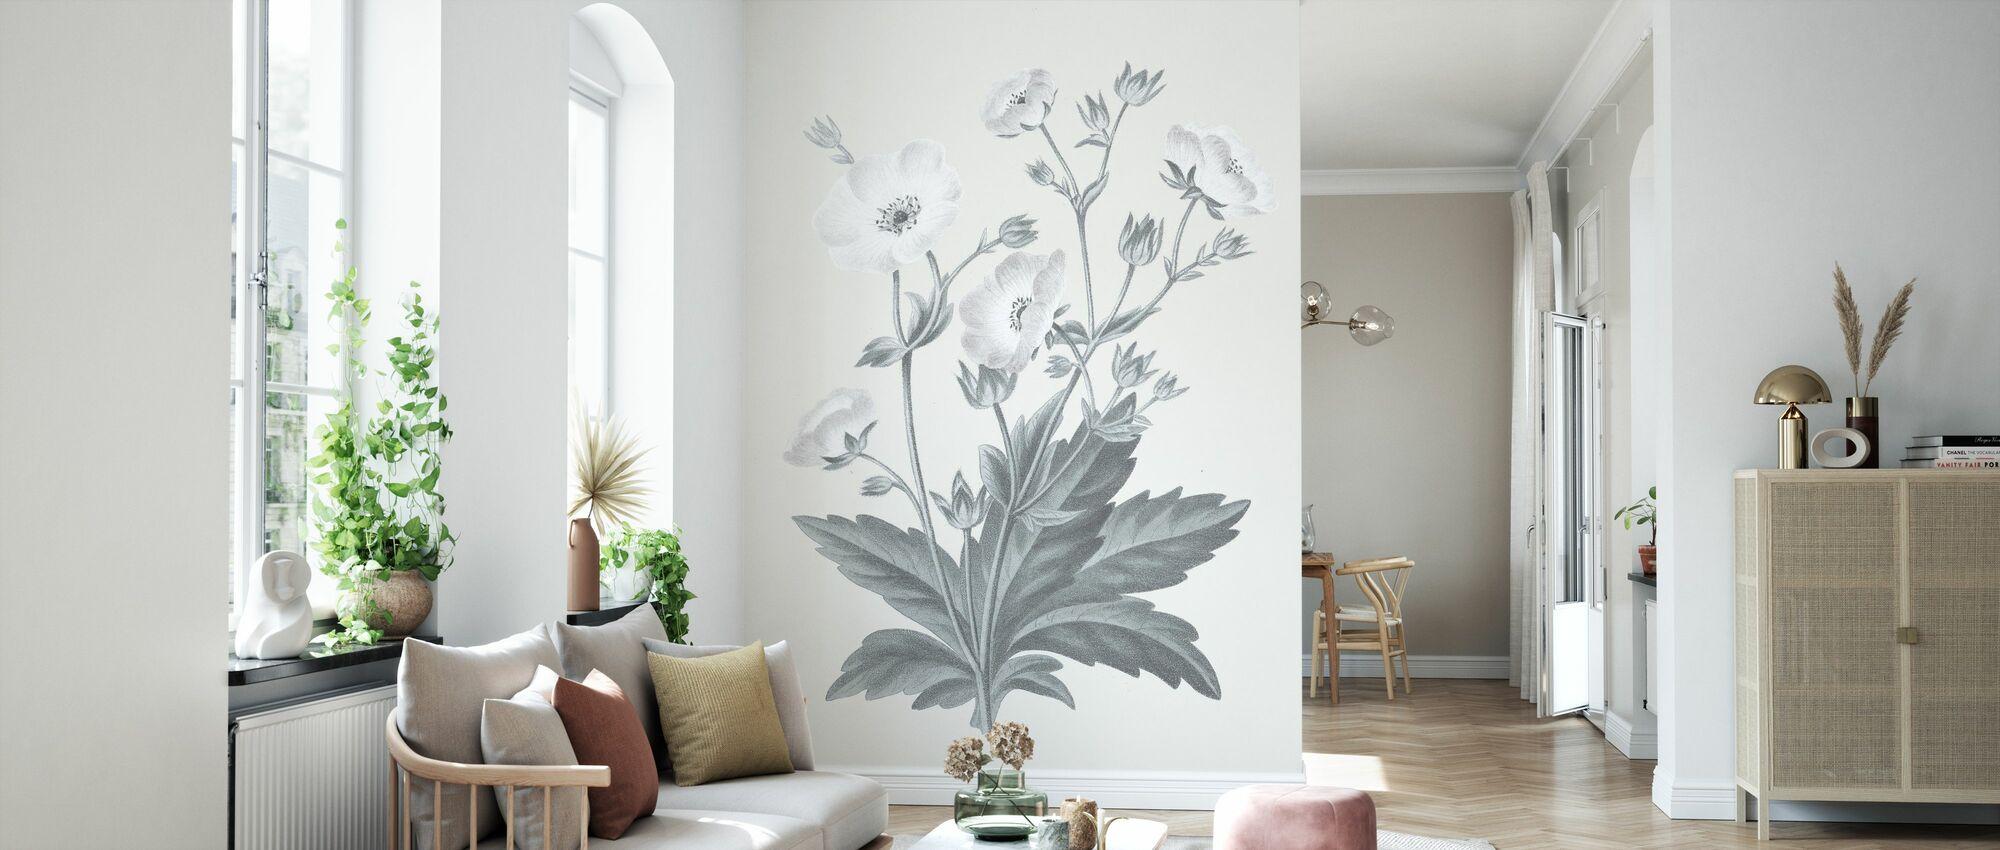 Neutral Botanical VI - Tapete - Wohnzimmer